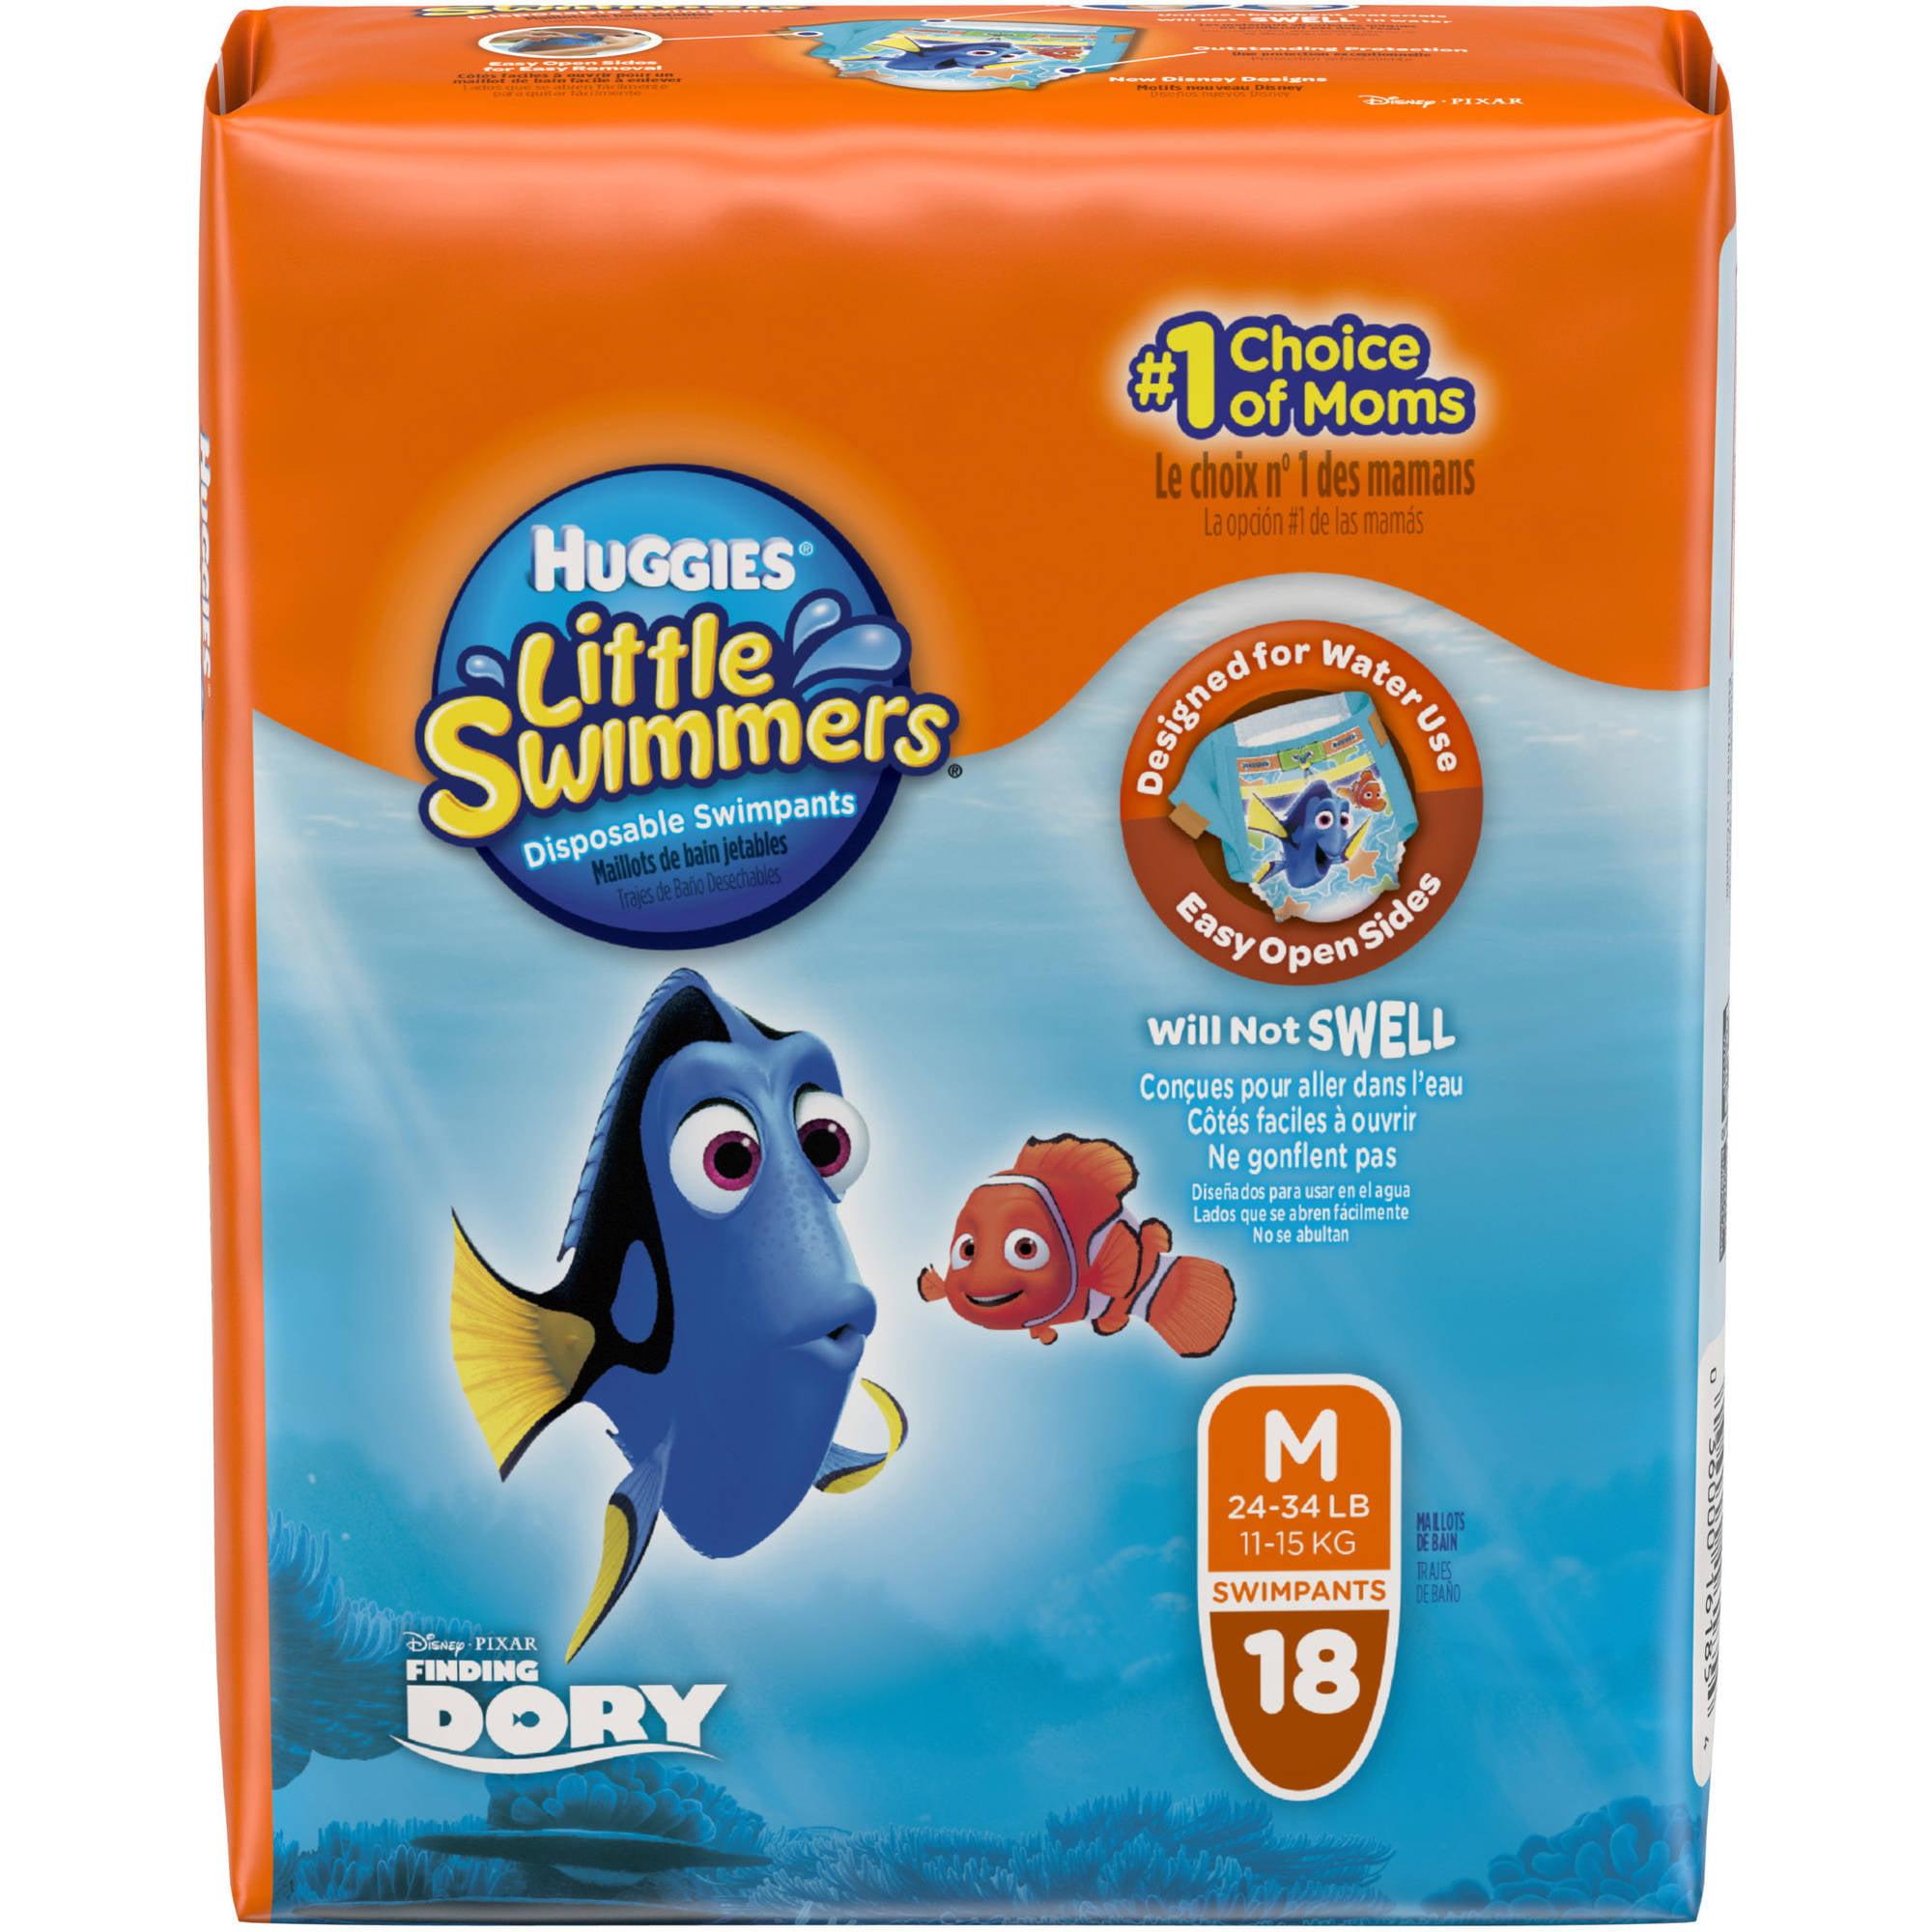 Huggies Little Swimmers Disposable Diaper Swim Pants, Size Medium, 18 Count